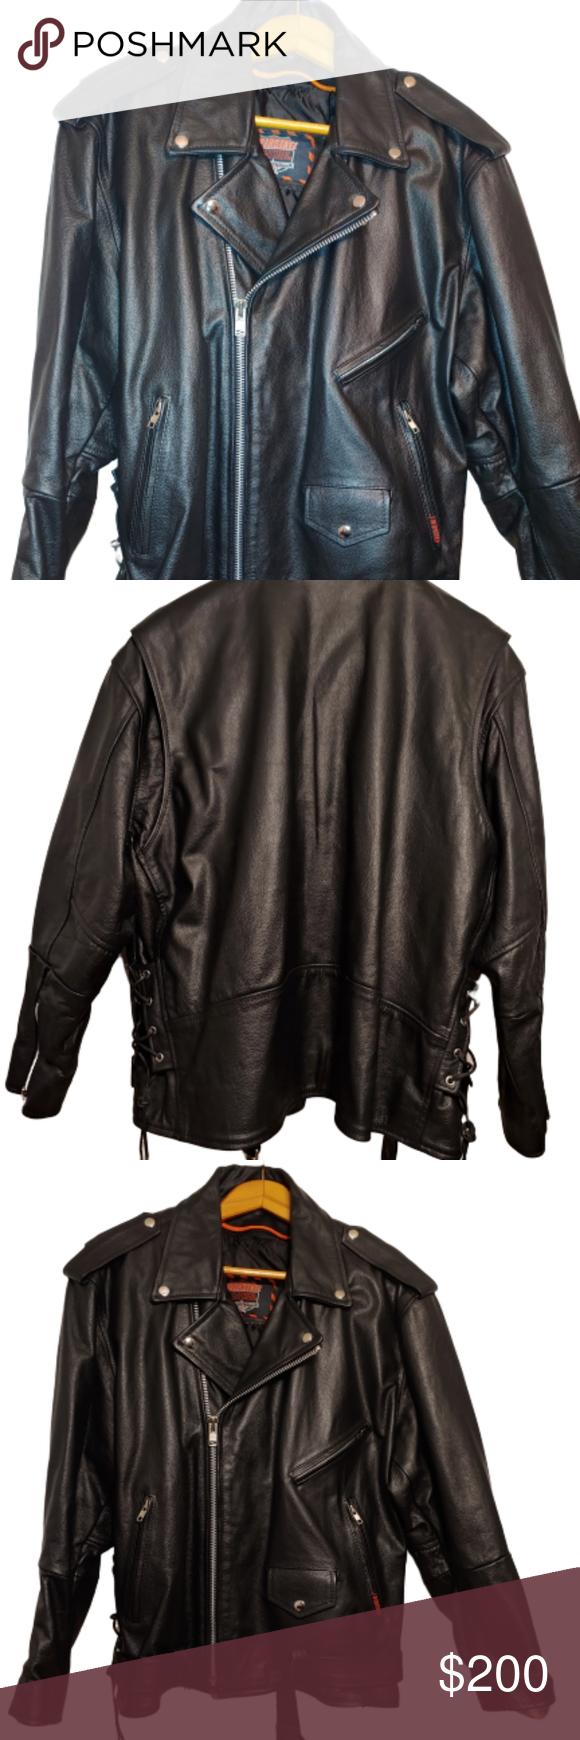 Nwot Interstate Leather Black Riding Jacket Fashion Clothes Design Pink North Face Jacket [ 1740 x 580 Pixel ]